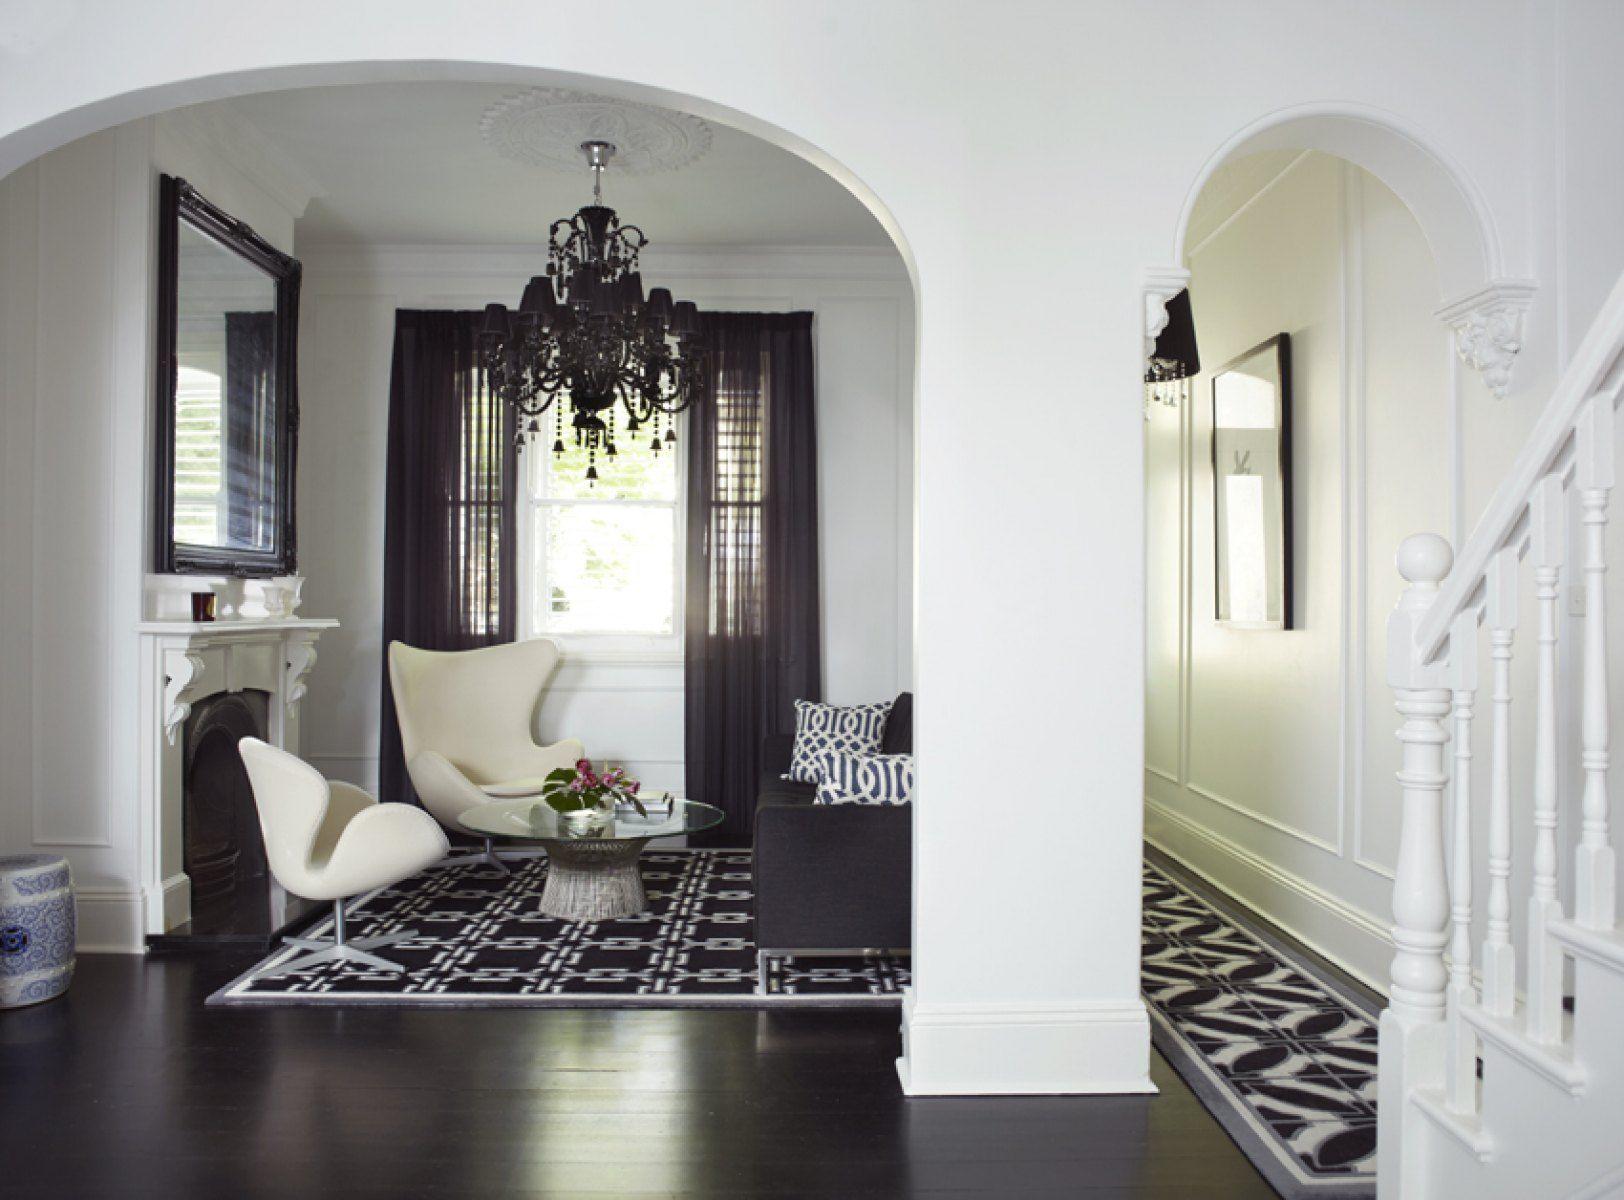 Archways Greg Natale | Sydney based architects and interior ...